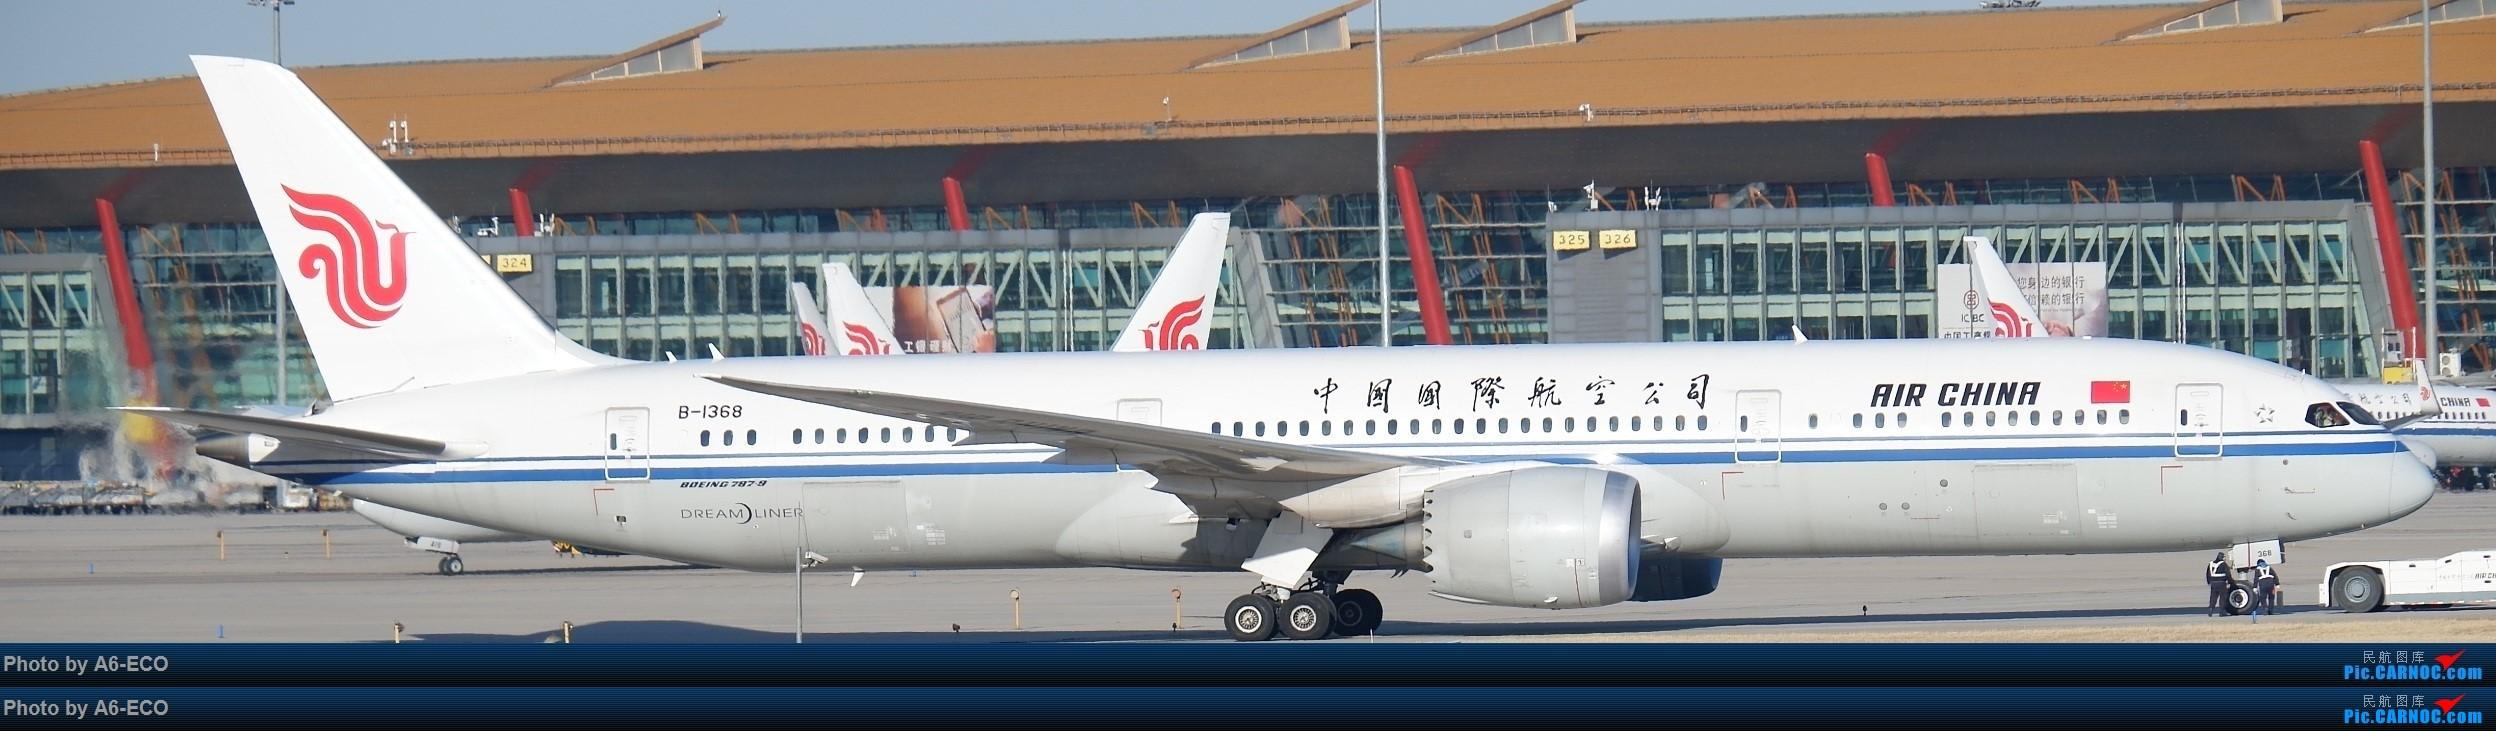 Re:Re:[原创]波音787首飞九周年发图祝贺一下 BOEING 787-9 B-1368 中国北京首都国际机场